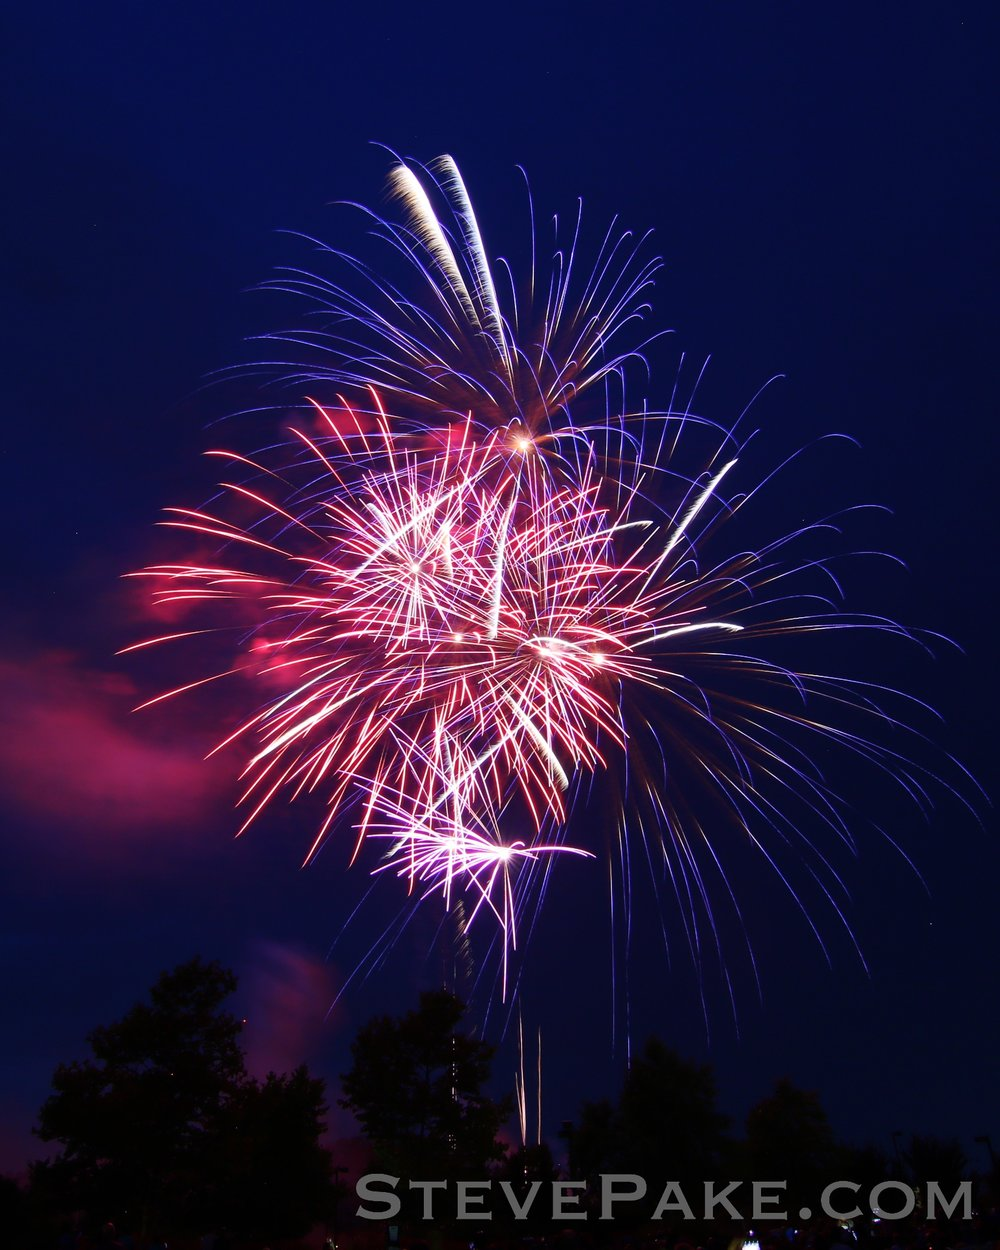 Fireworks2018_21_GE3A8528ap-HD-WM.jpg